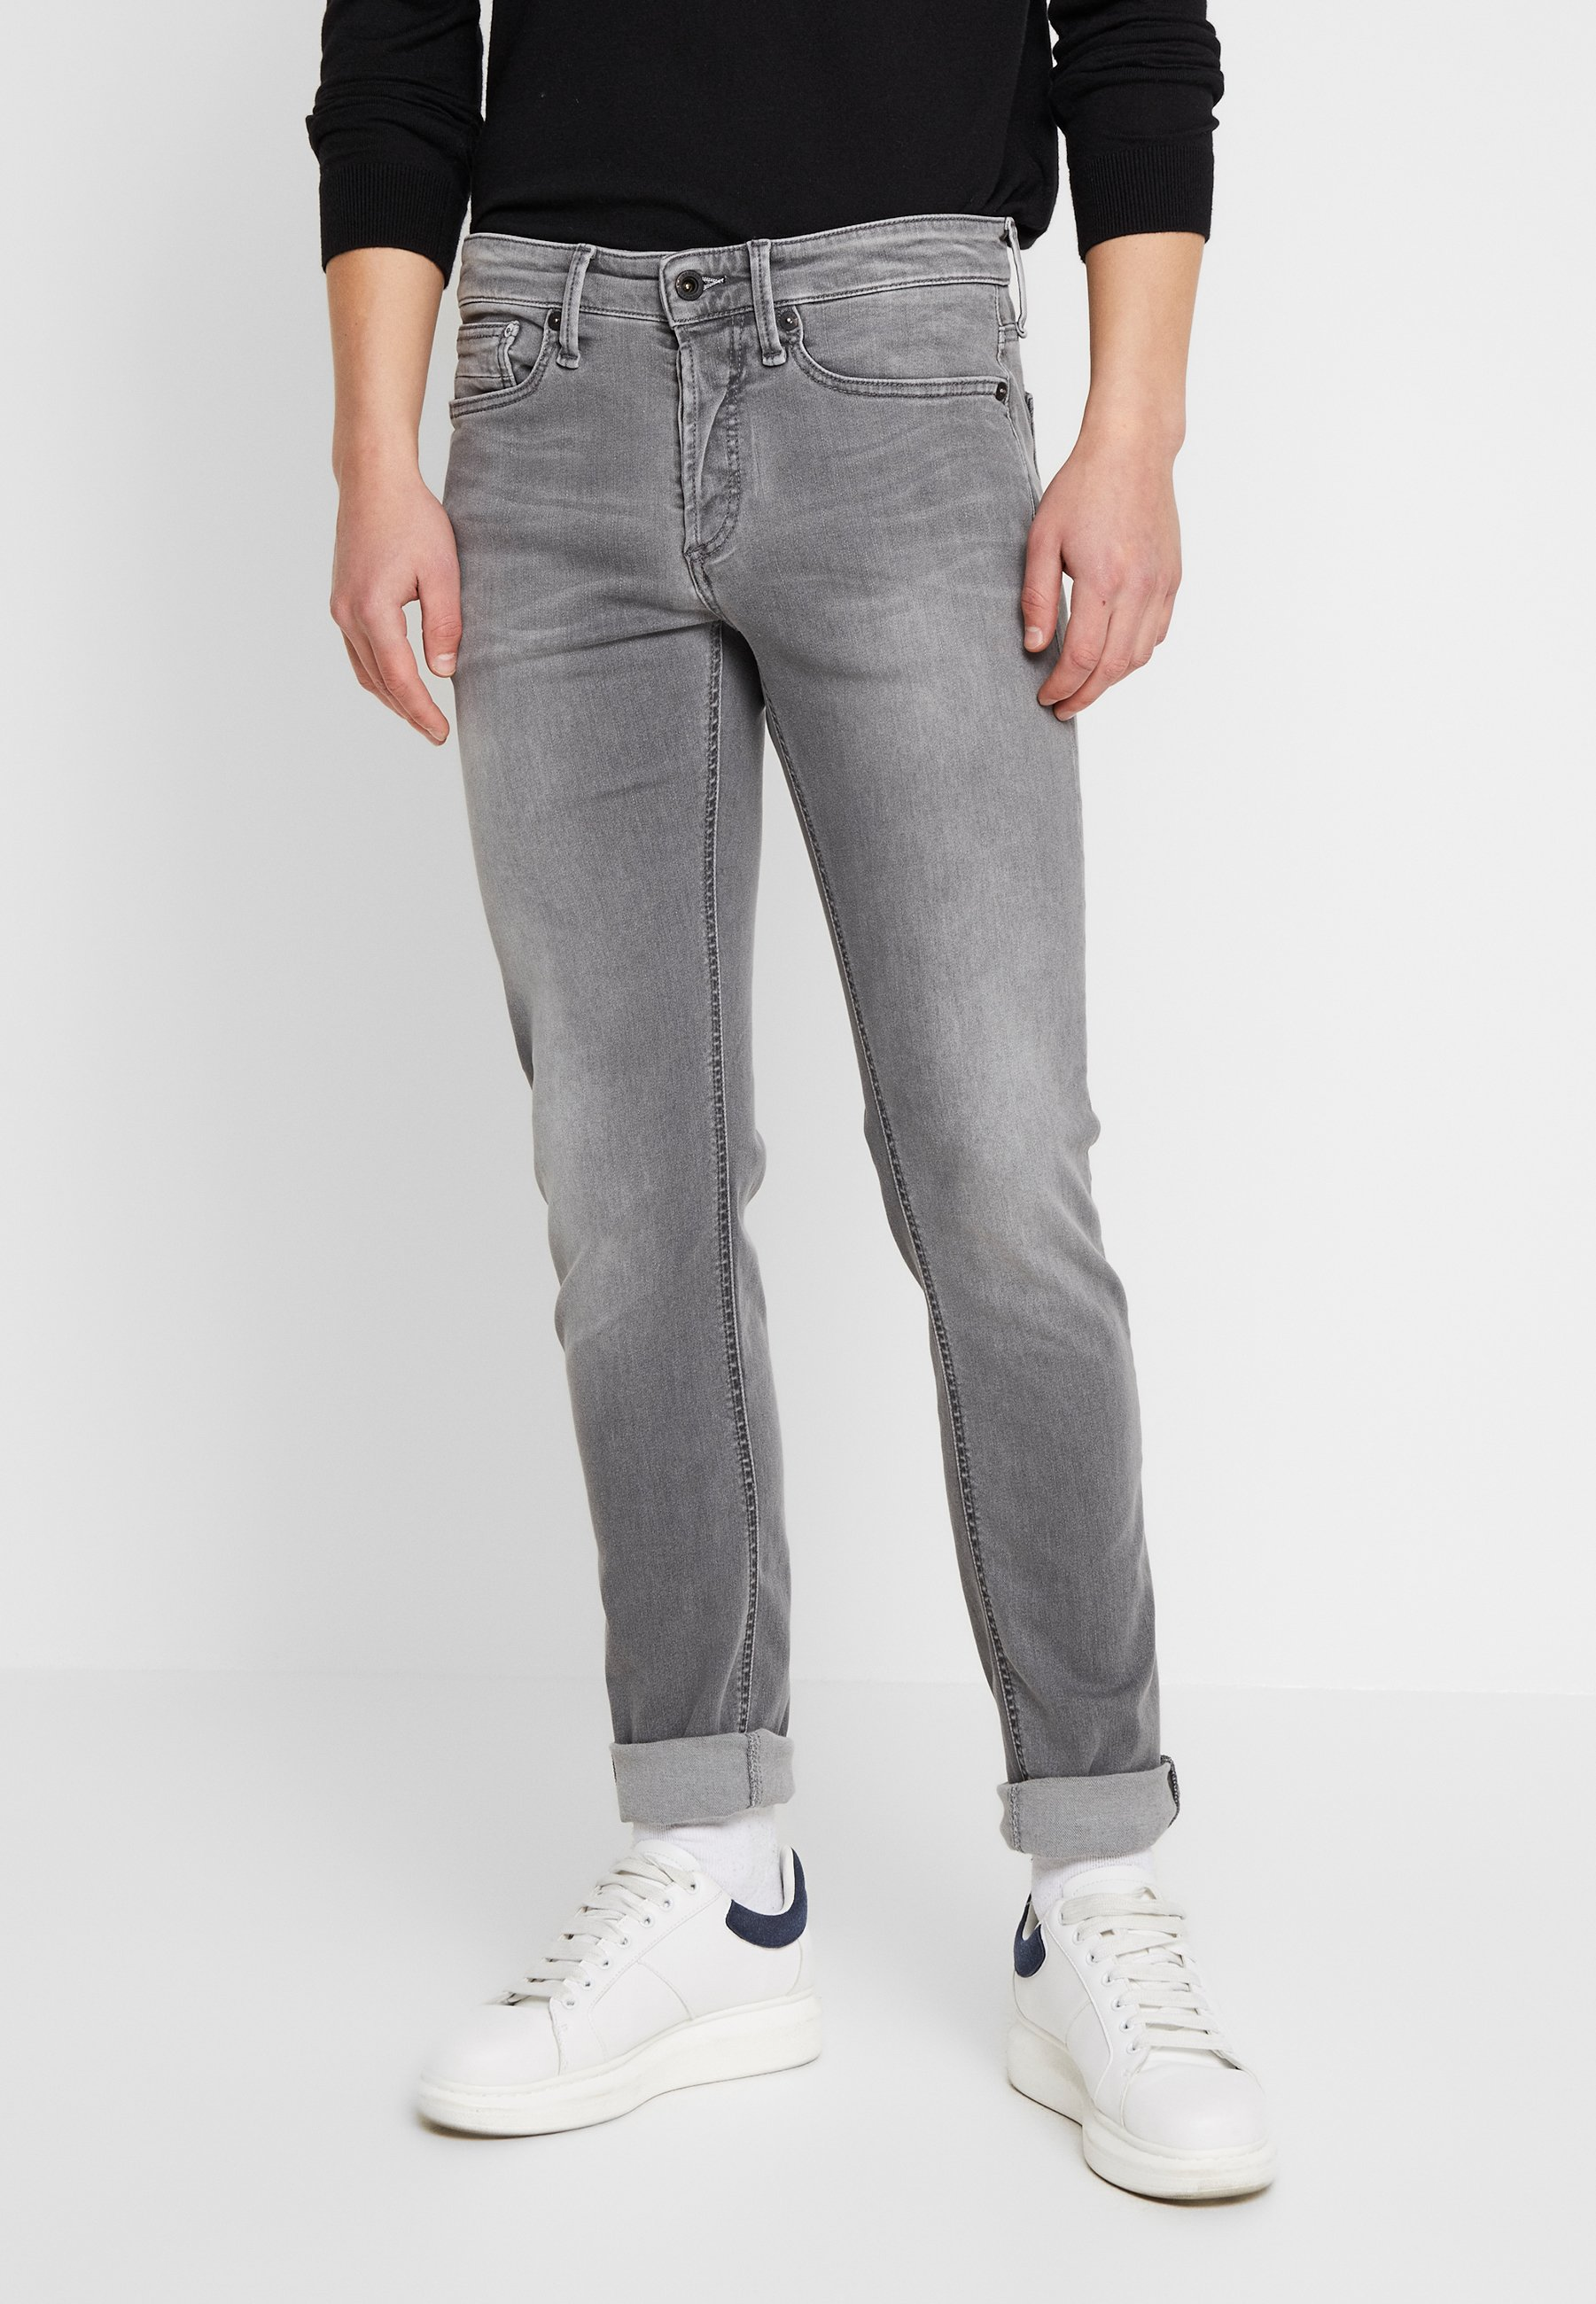 Uomo BOLT FREE MOVE - Jeans slim fit